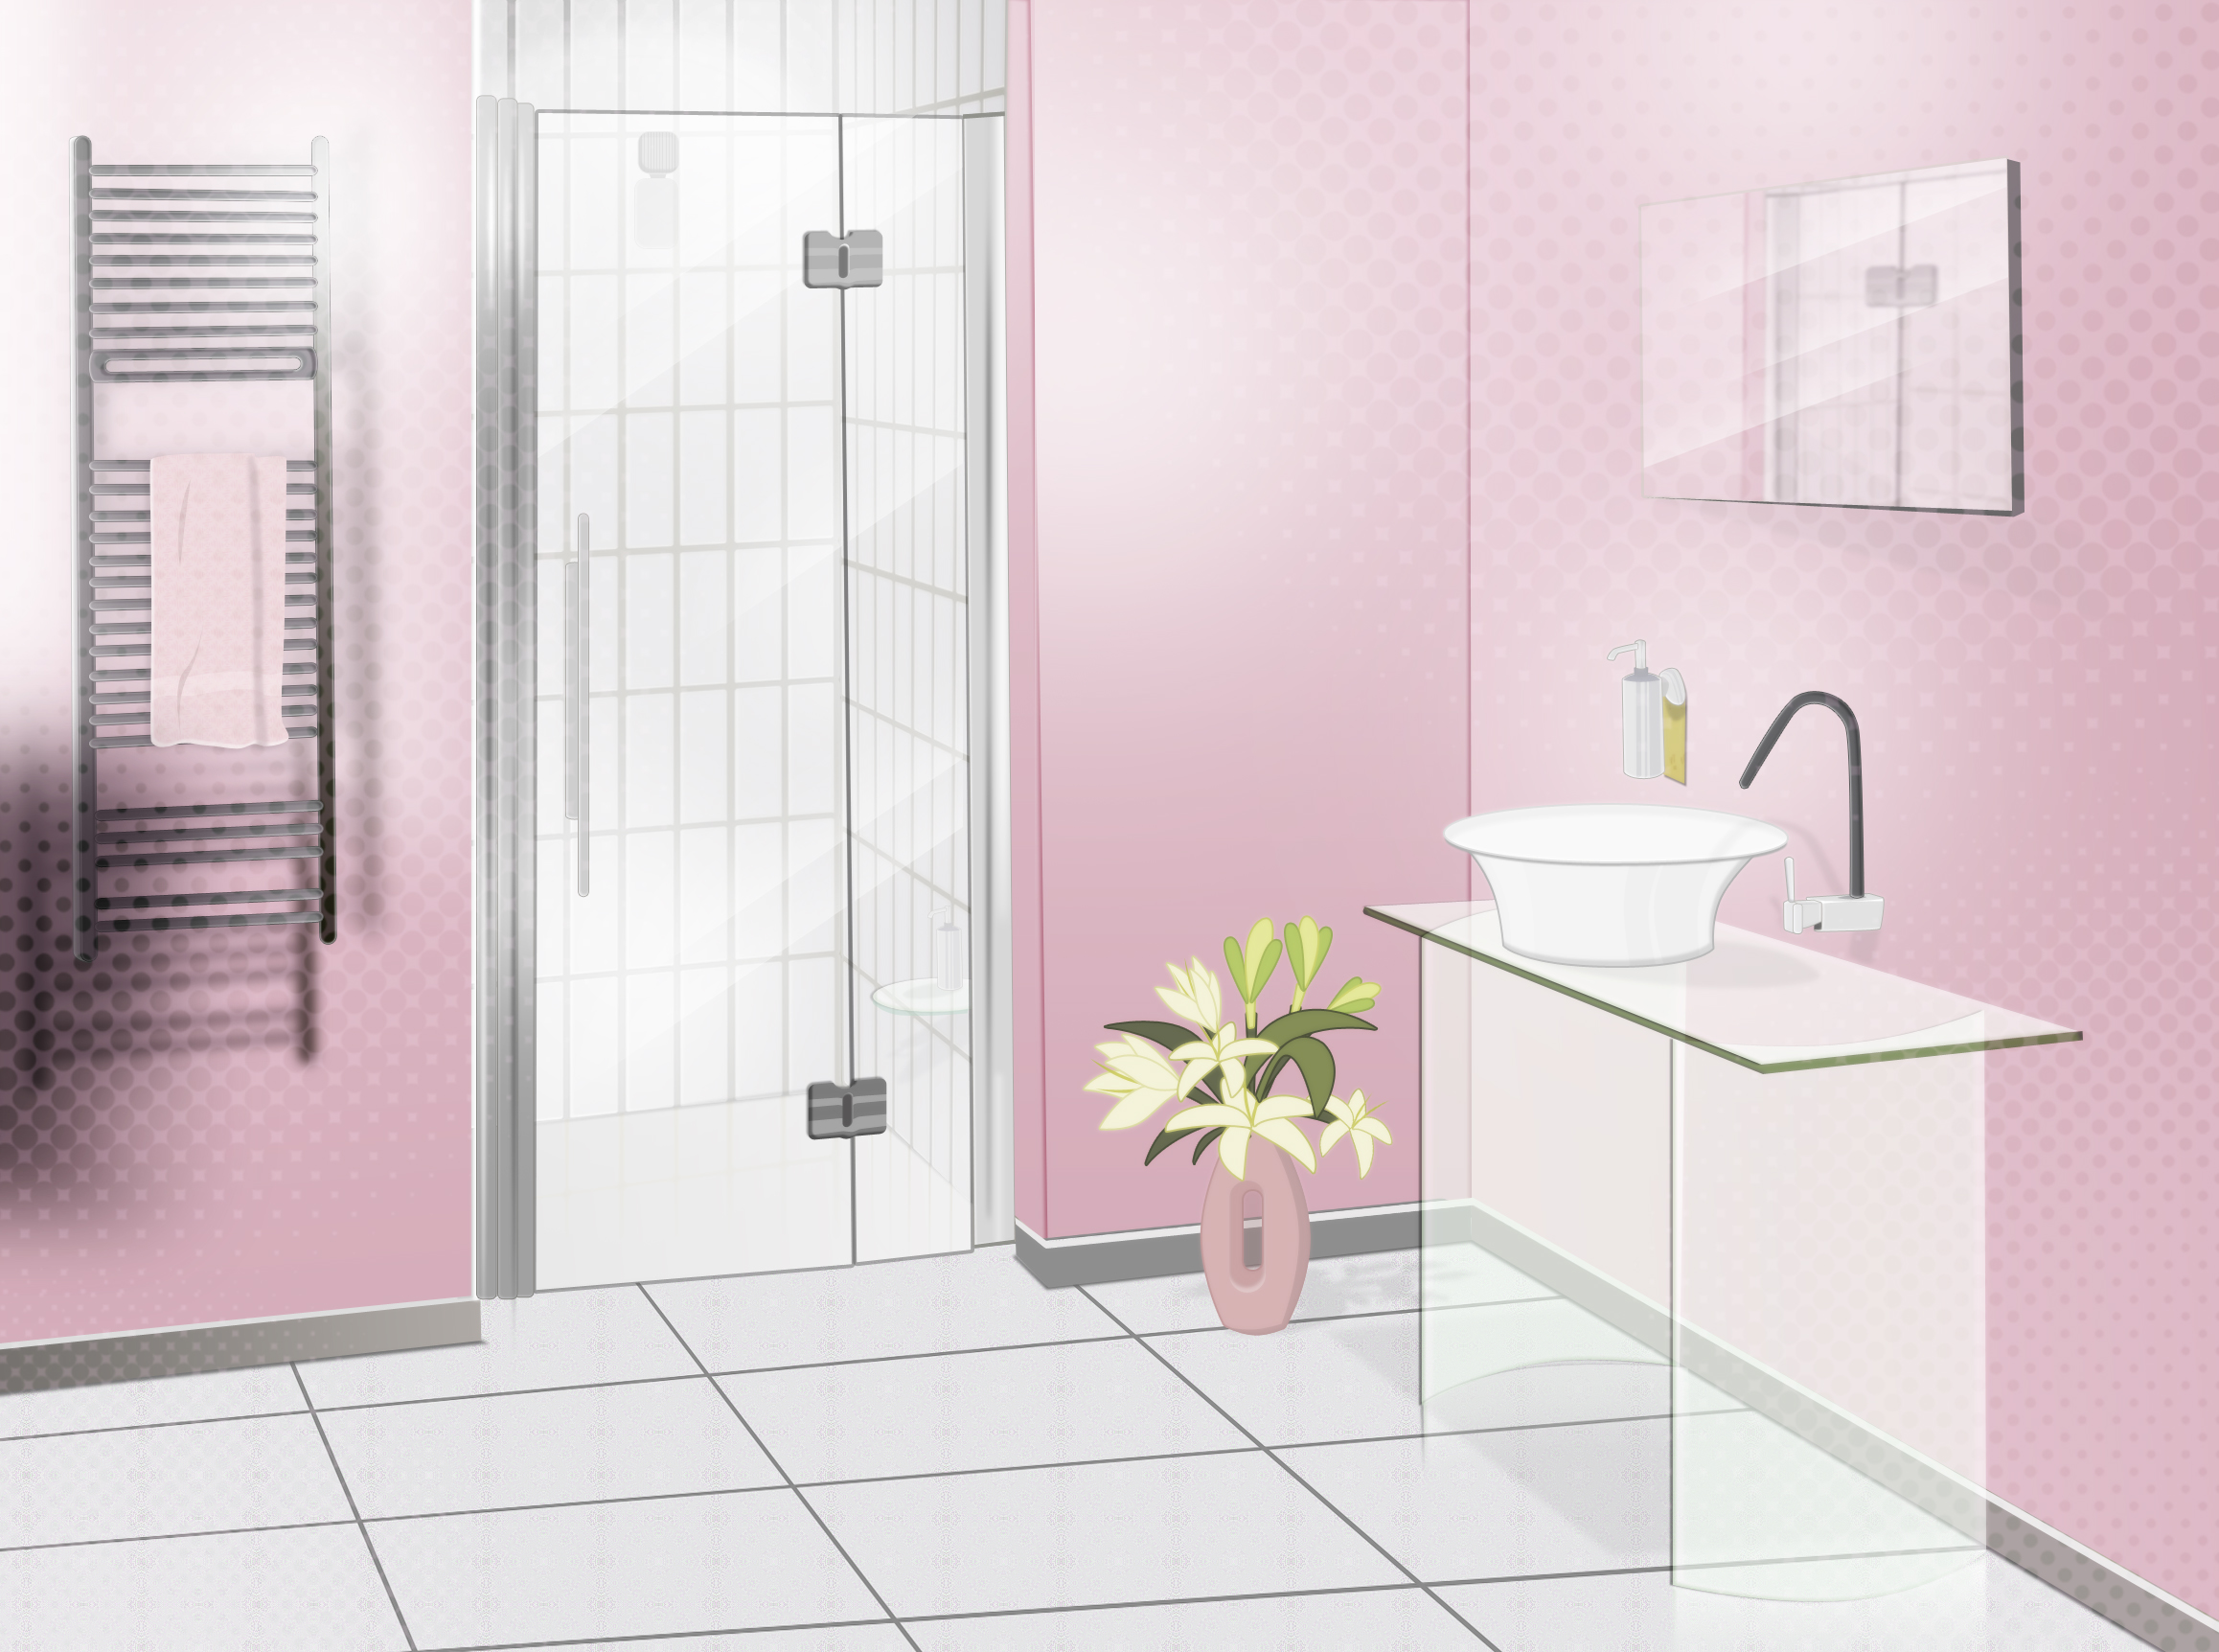 Bathroom vector by usuinyanya on deviantart for Bathroom pics